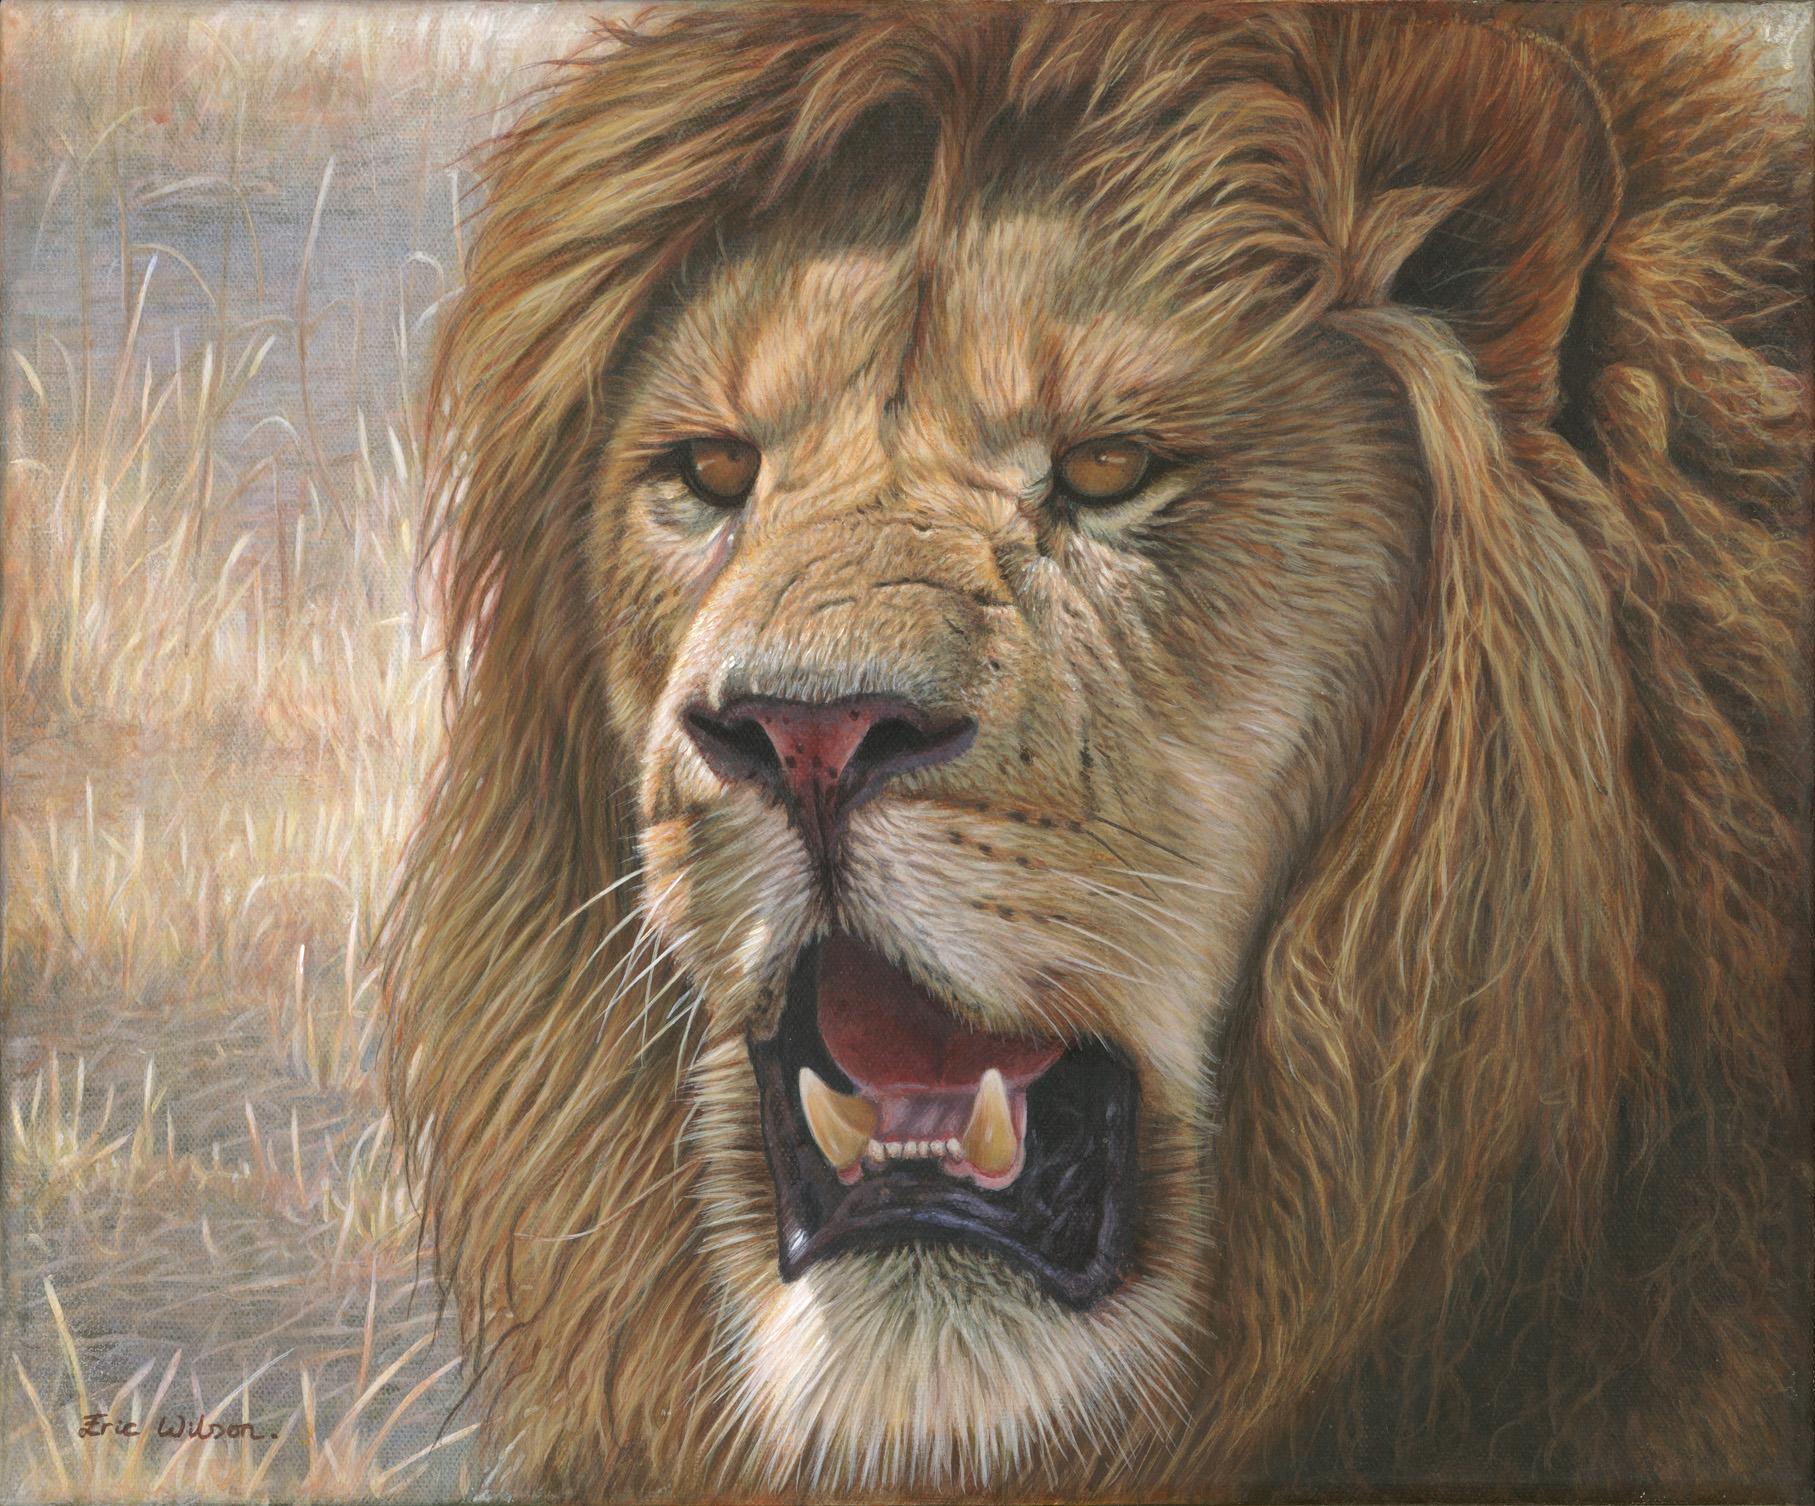 'Samoni' Acrylic on fine linen. 12 x 10 inches. £950